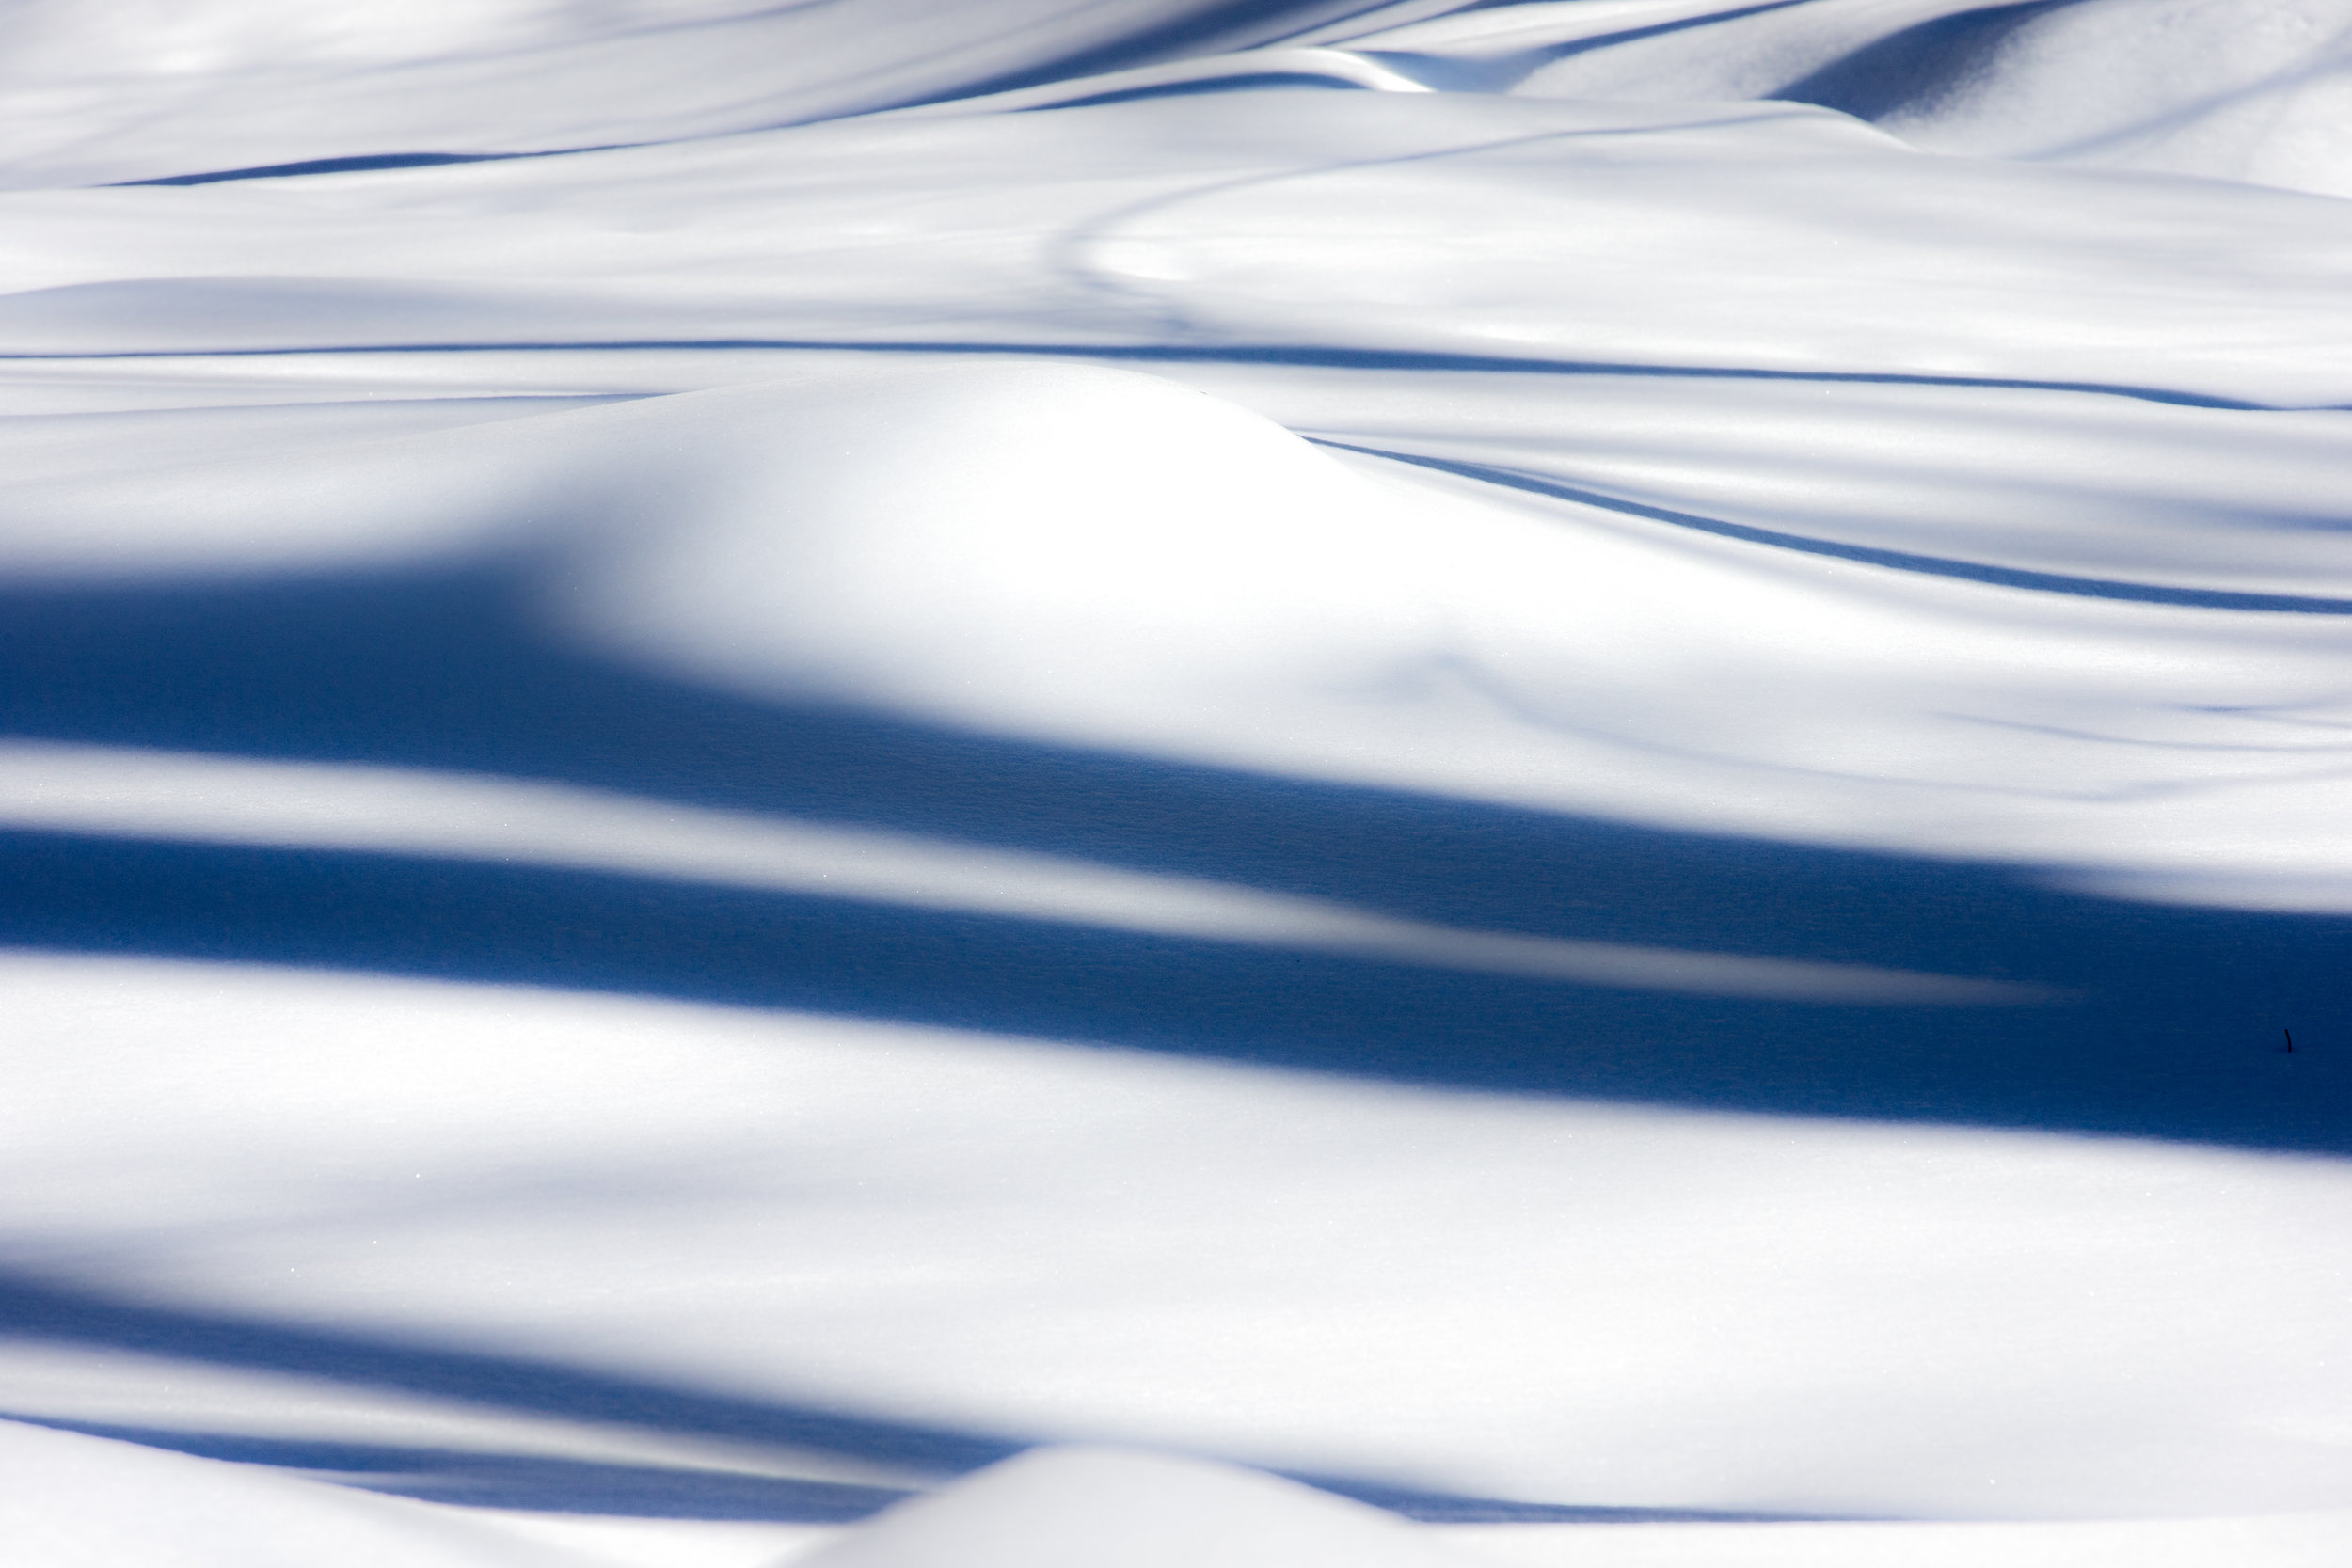 Abstract Silk